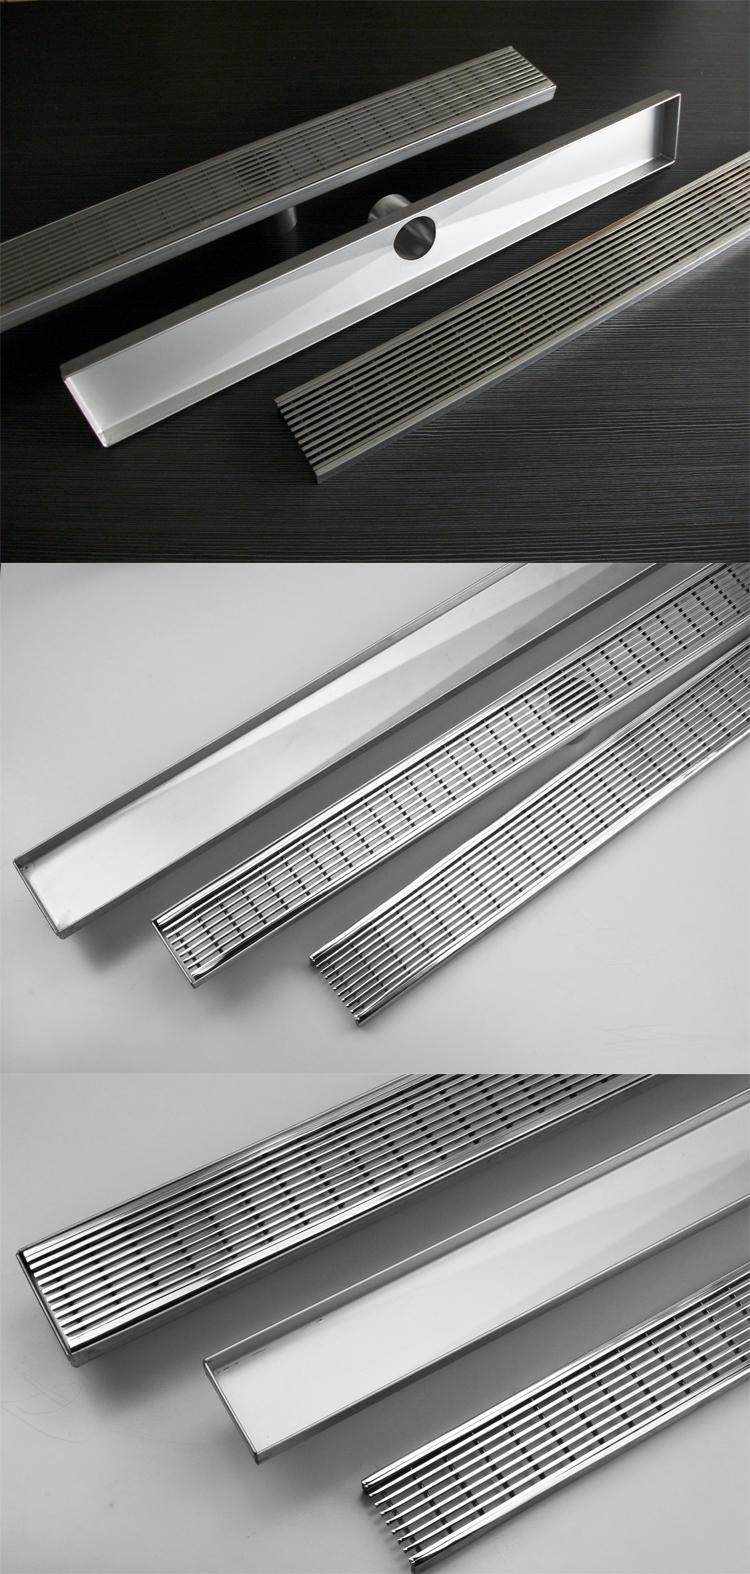 2017 durable stainless steel garage decorative types of floor 2017 durable stainless steel garage decorative types of floor drain outdoor linear drain